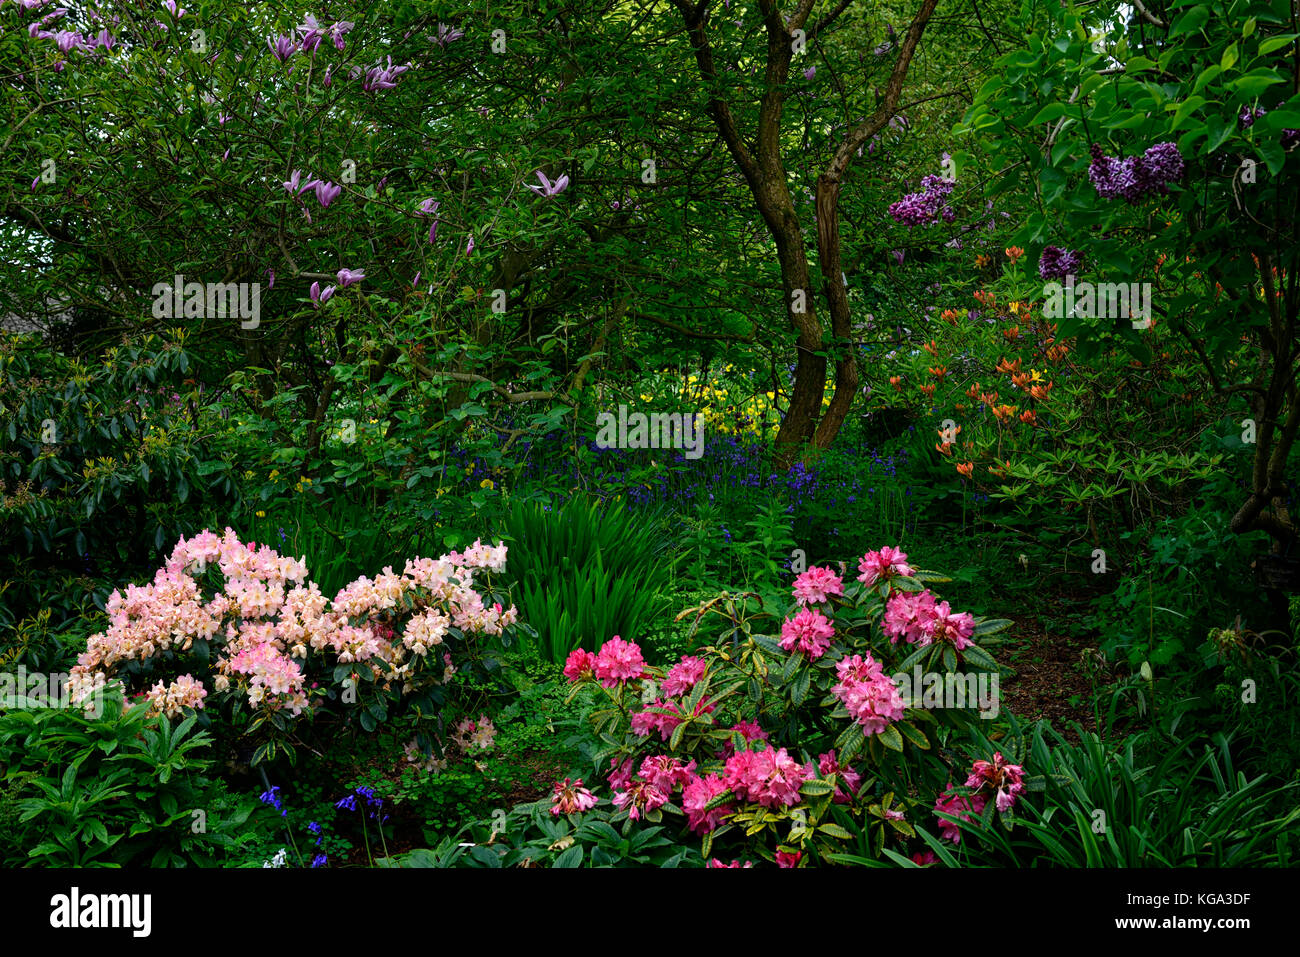 Woodland Planting Magnolia Rhododendron Azalea Bluebells Lilac